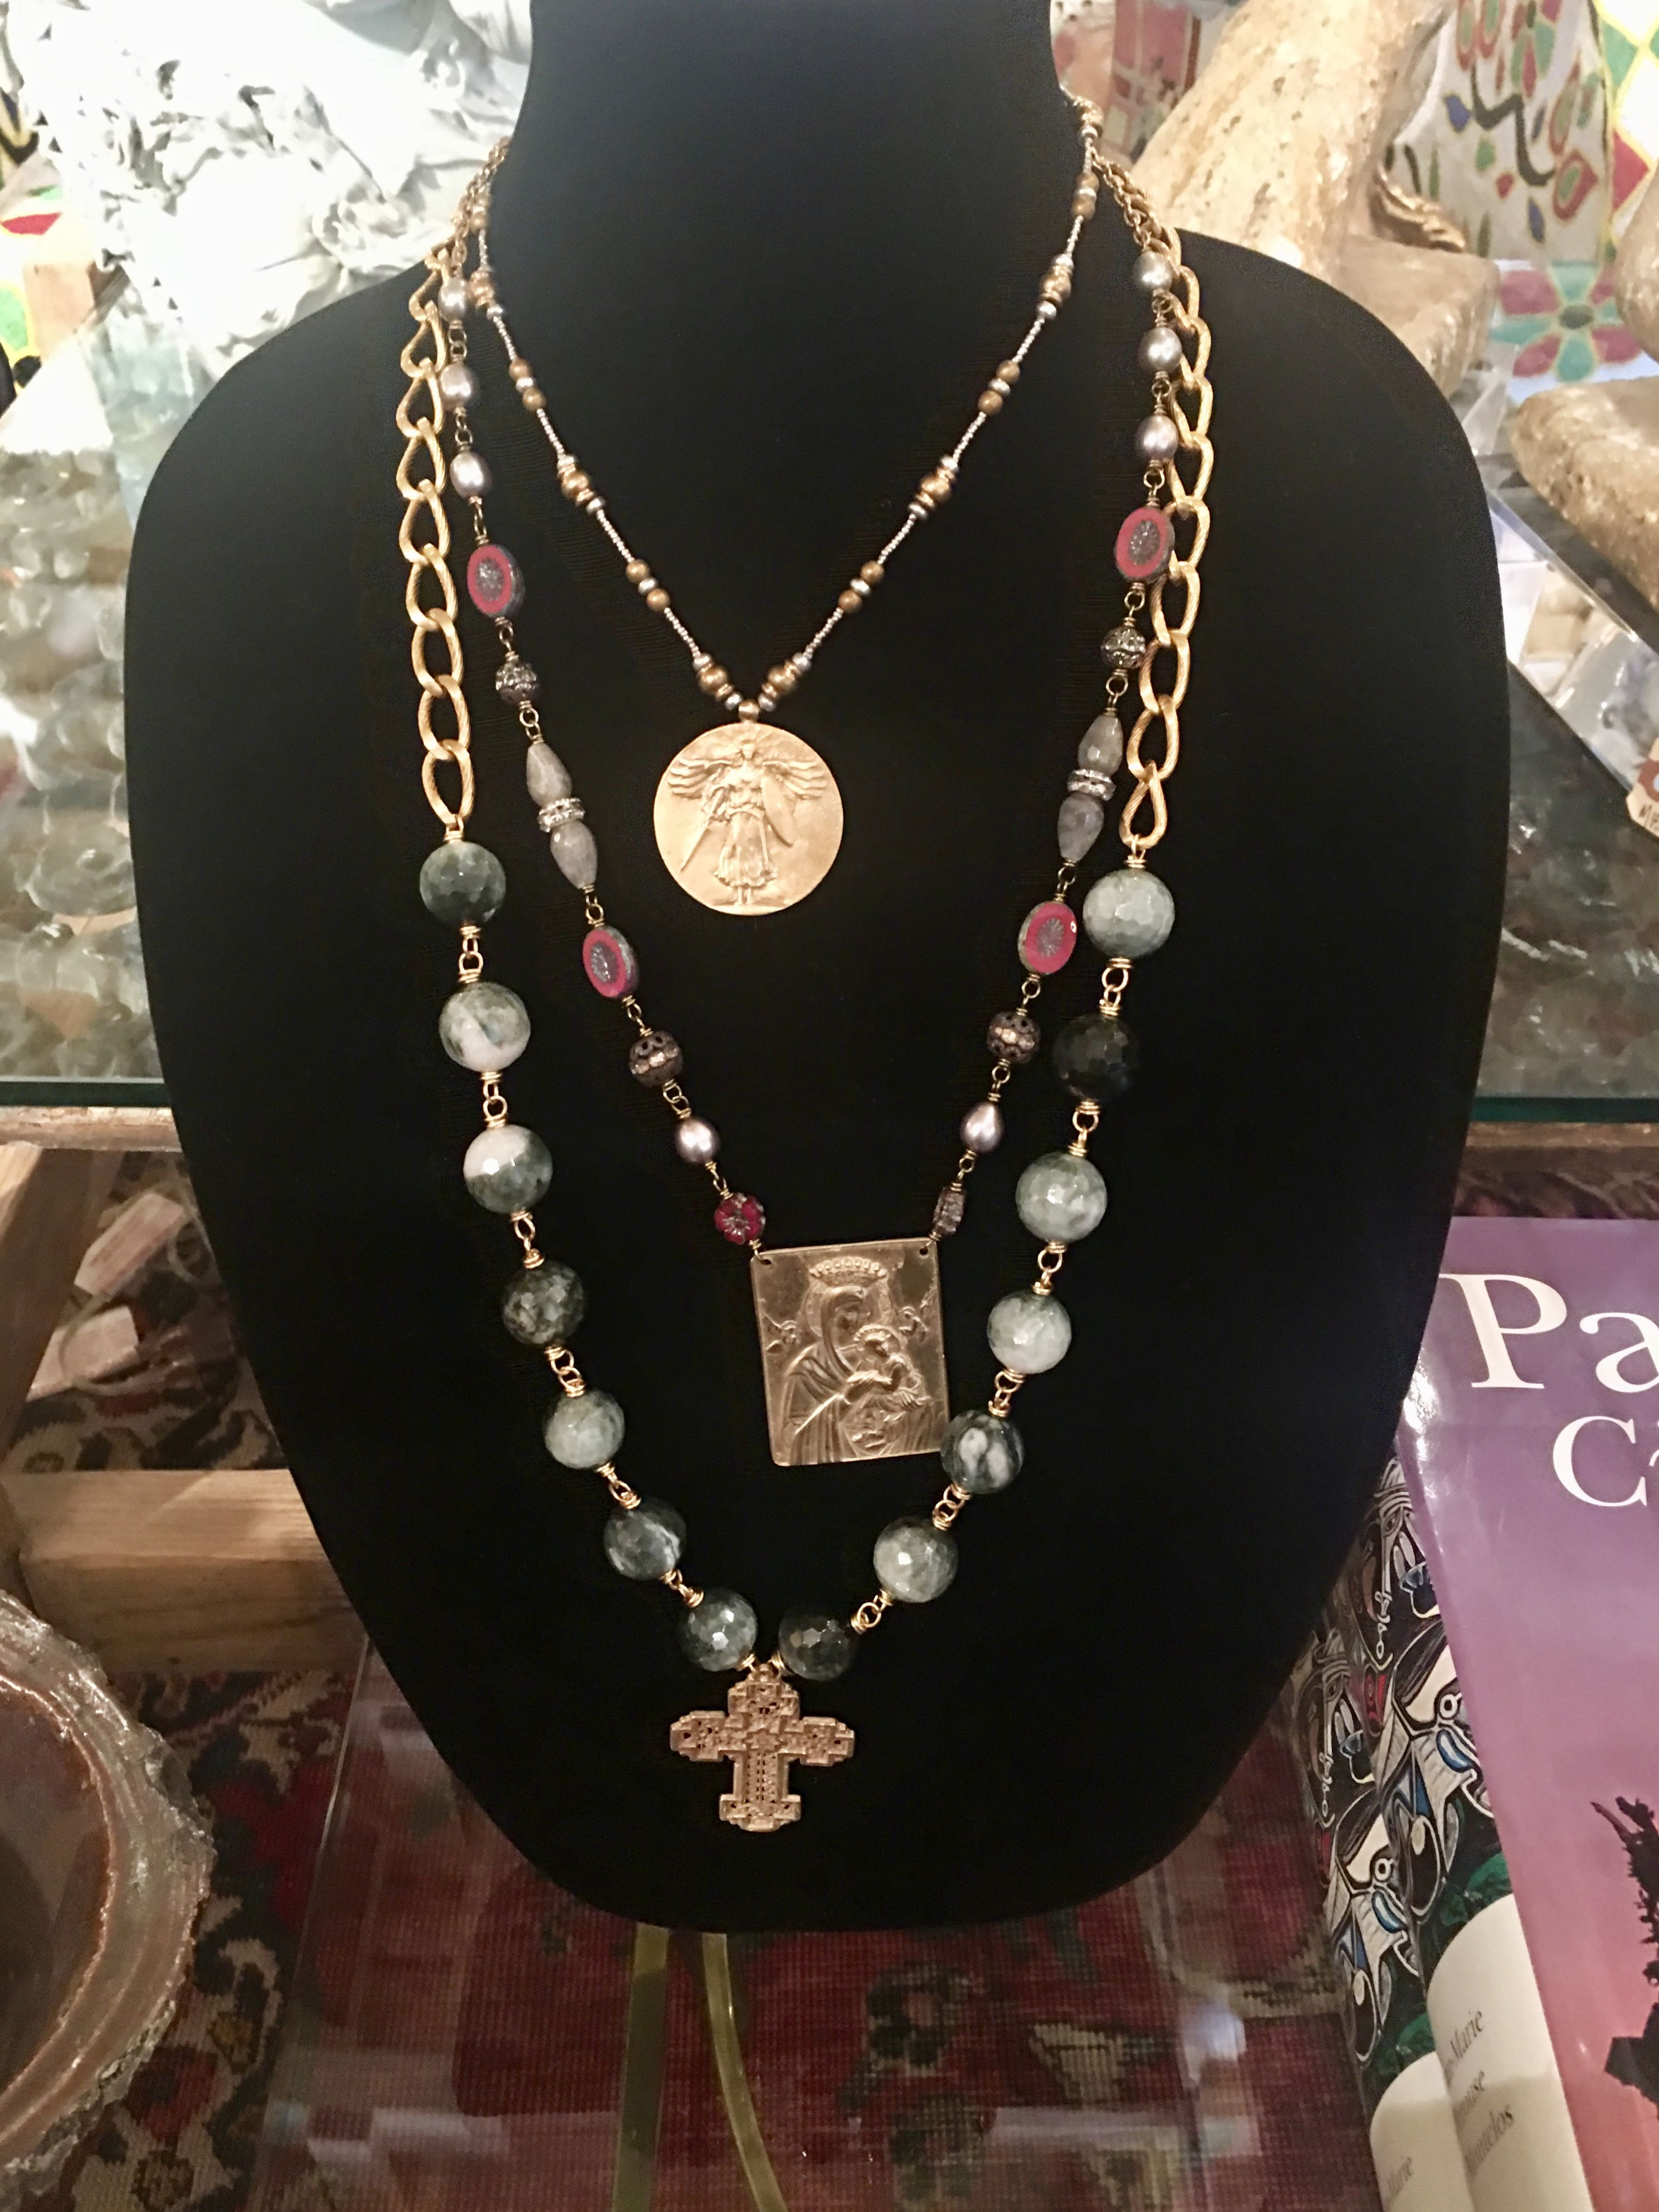 Andrea Barnett Jewelry With Beautiful Czechoslovakian Beads and